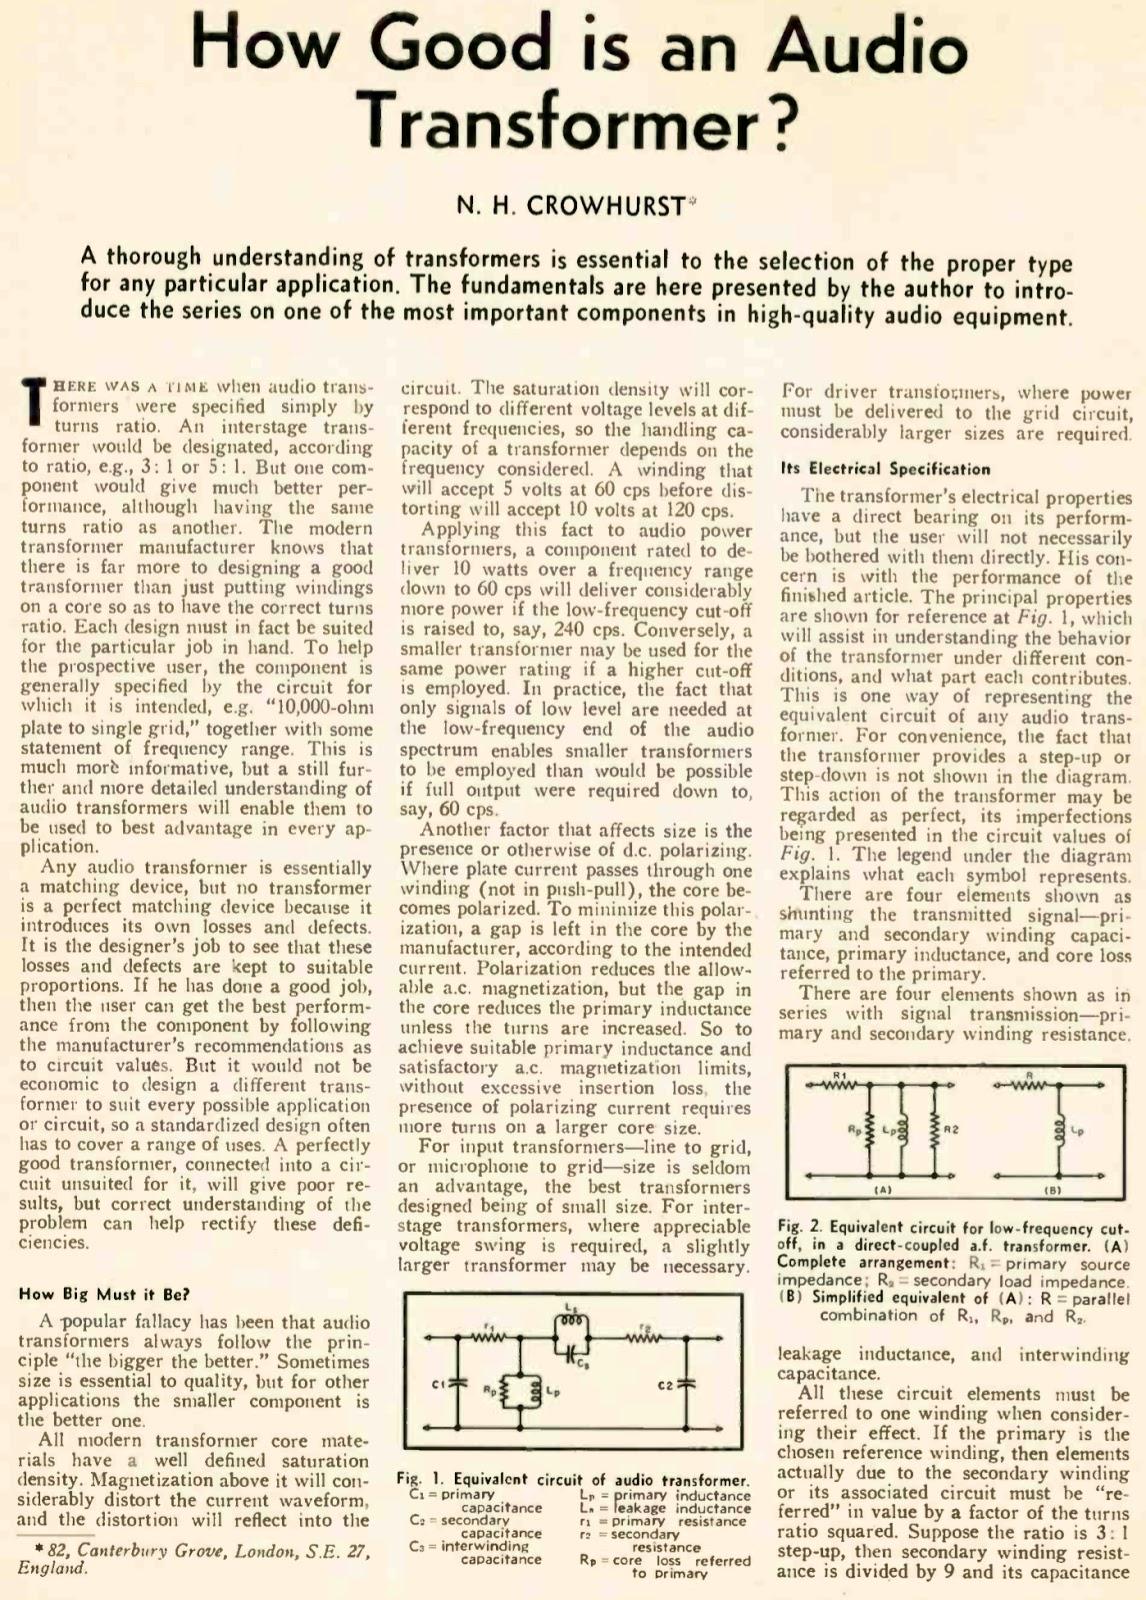 retro vintage modern hi-fi: output transformer